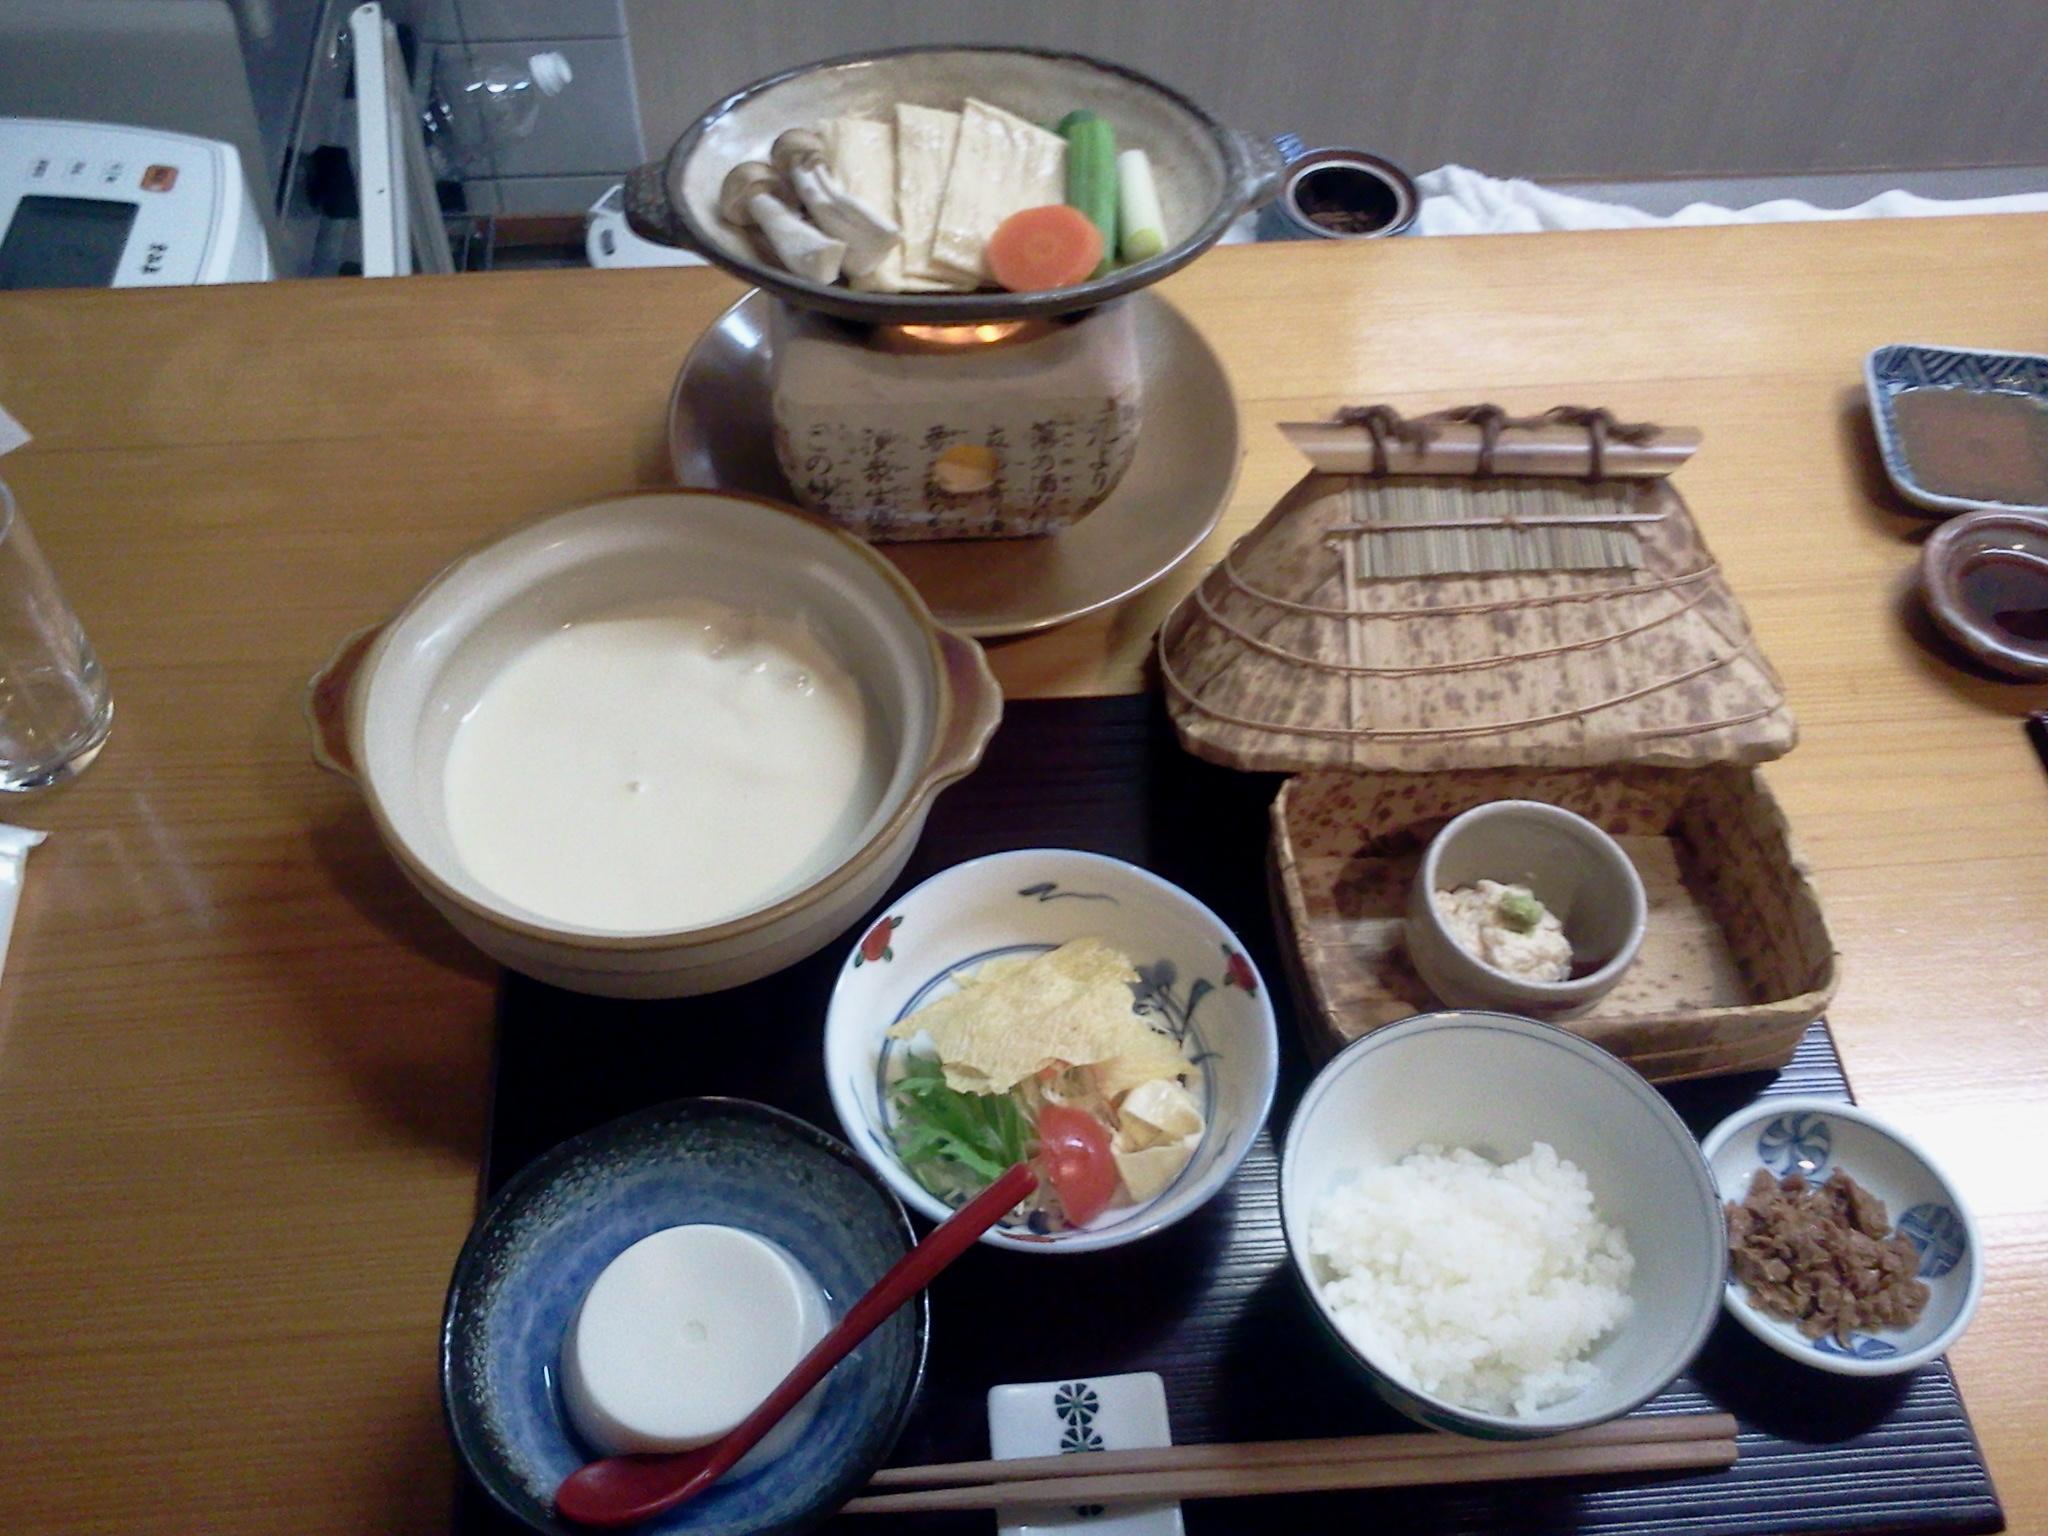 https://www.uukyoto.com/syokuzi/seike.jpg